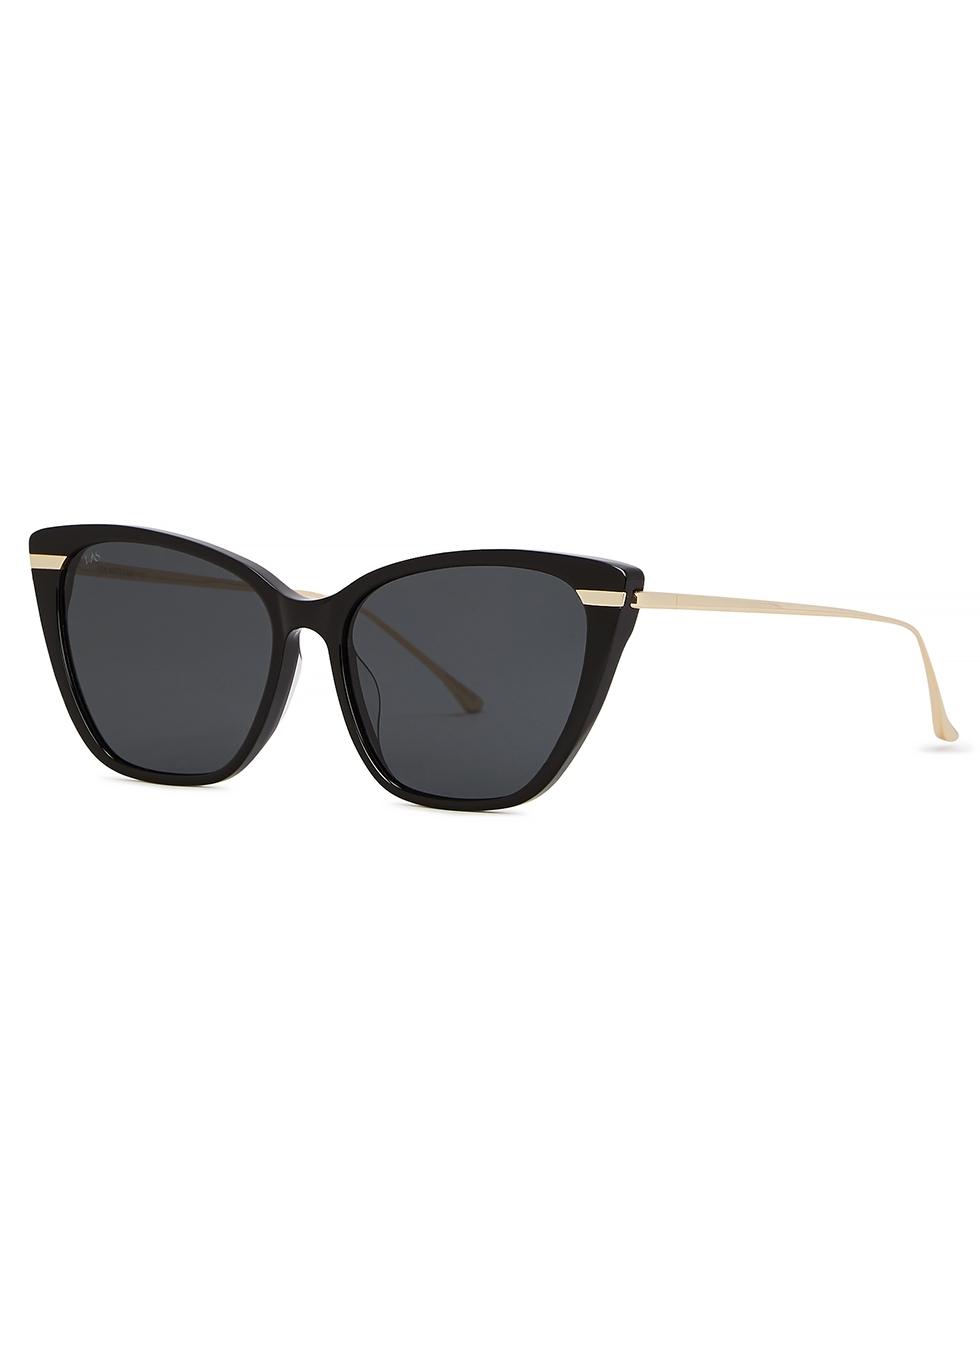 9e12f4c754 Women s Designer Cat-Eye Sunglasses - Harvey Nichols